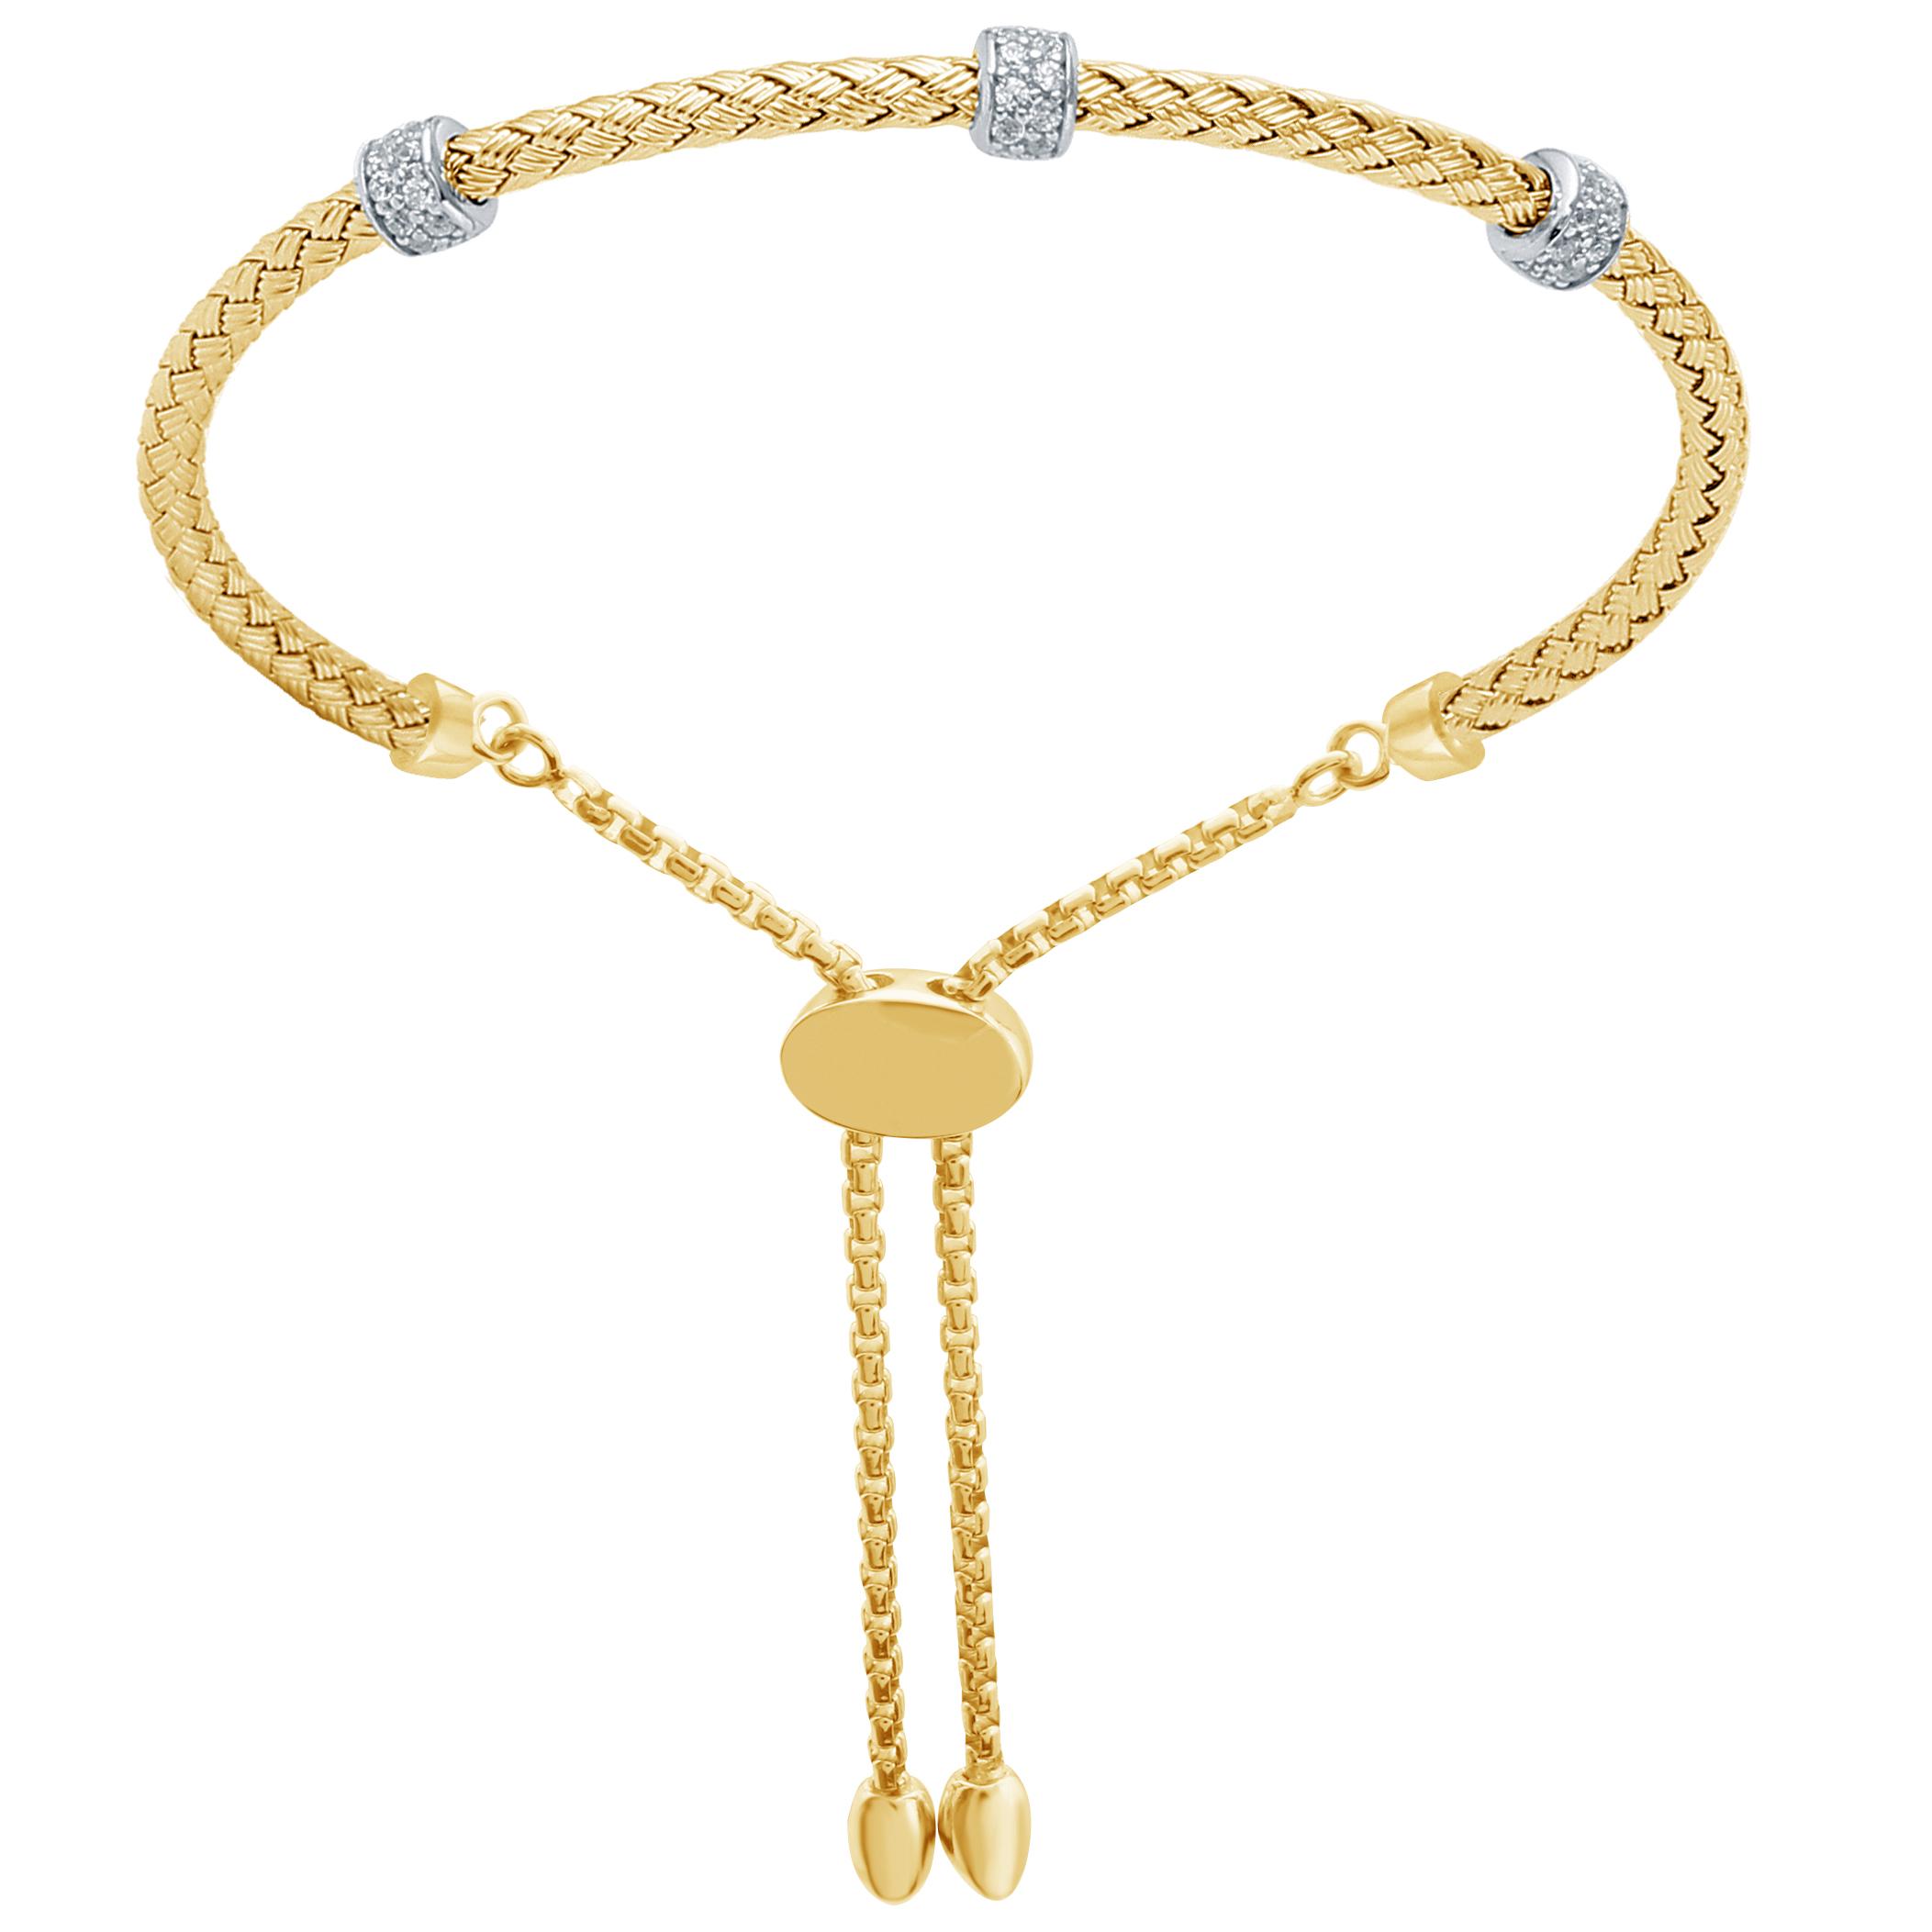 CHARLES GARNIER - Sterling Silver and CZ Bracelet